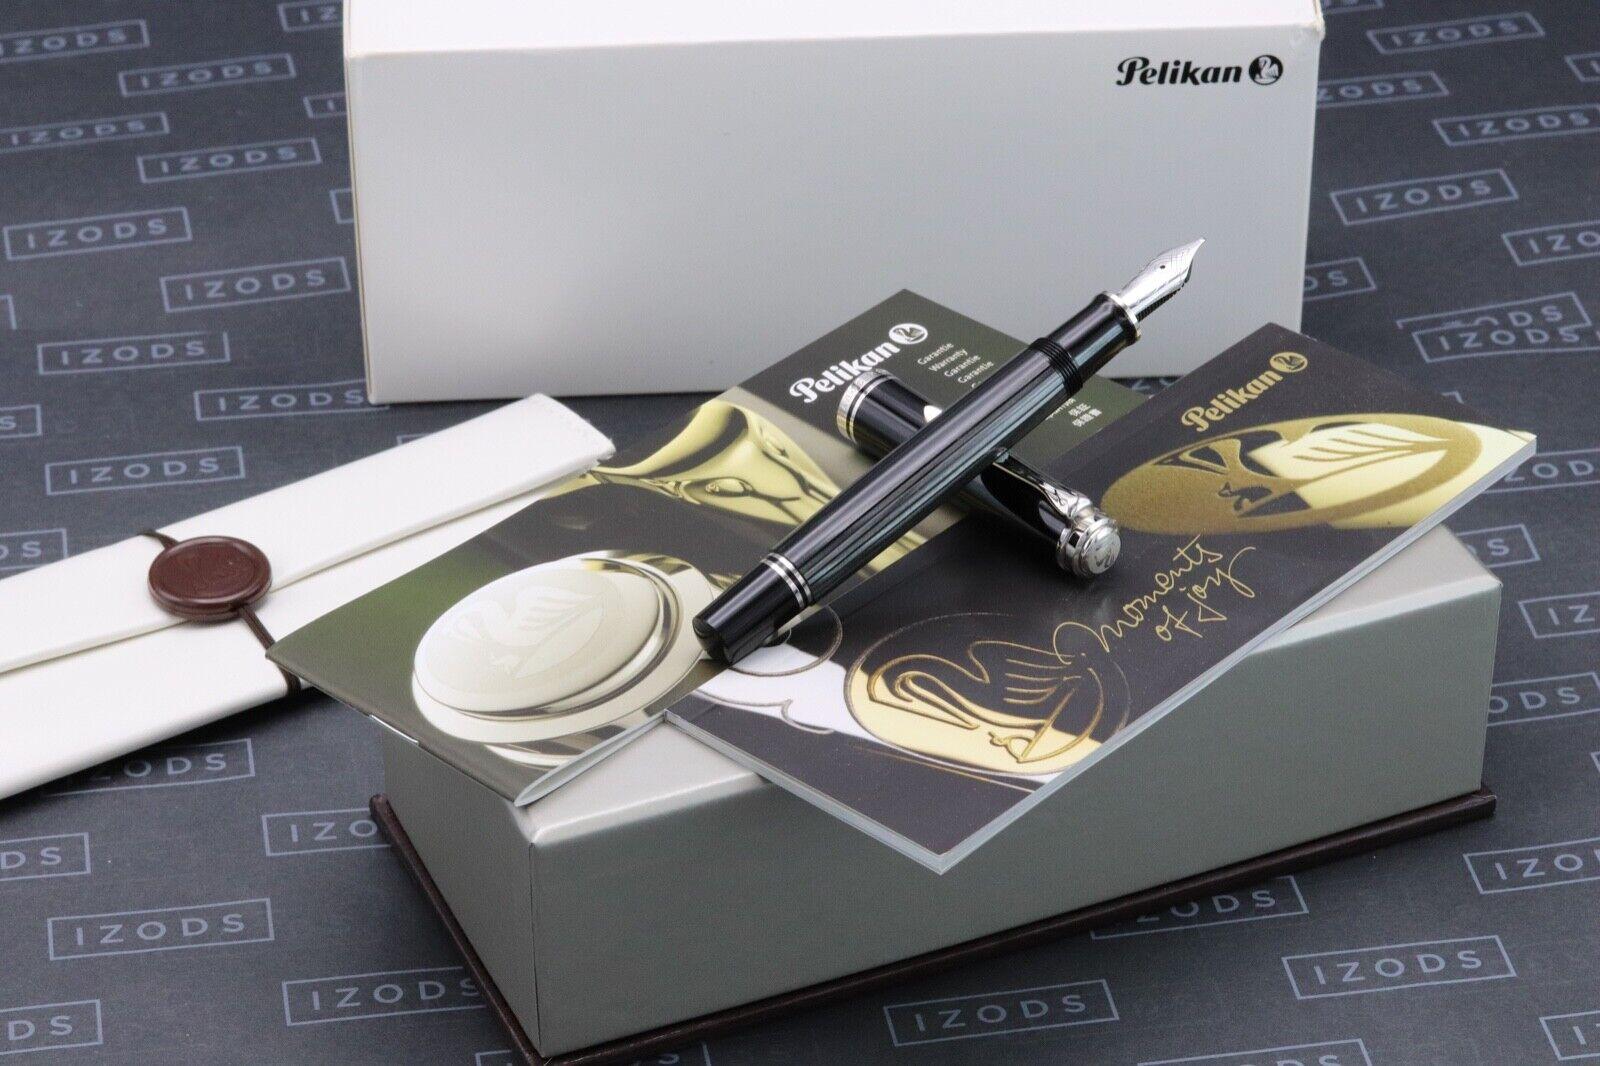 Pelikan Souveran M805 Stresemann Fountain Pen - CIB Nib